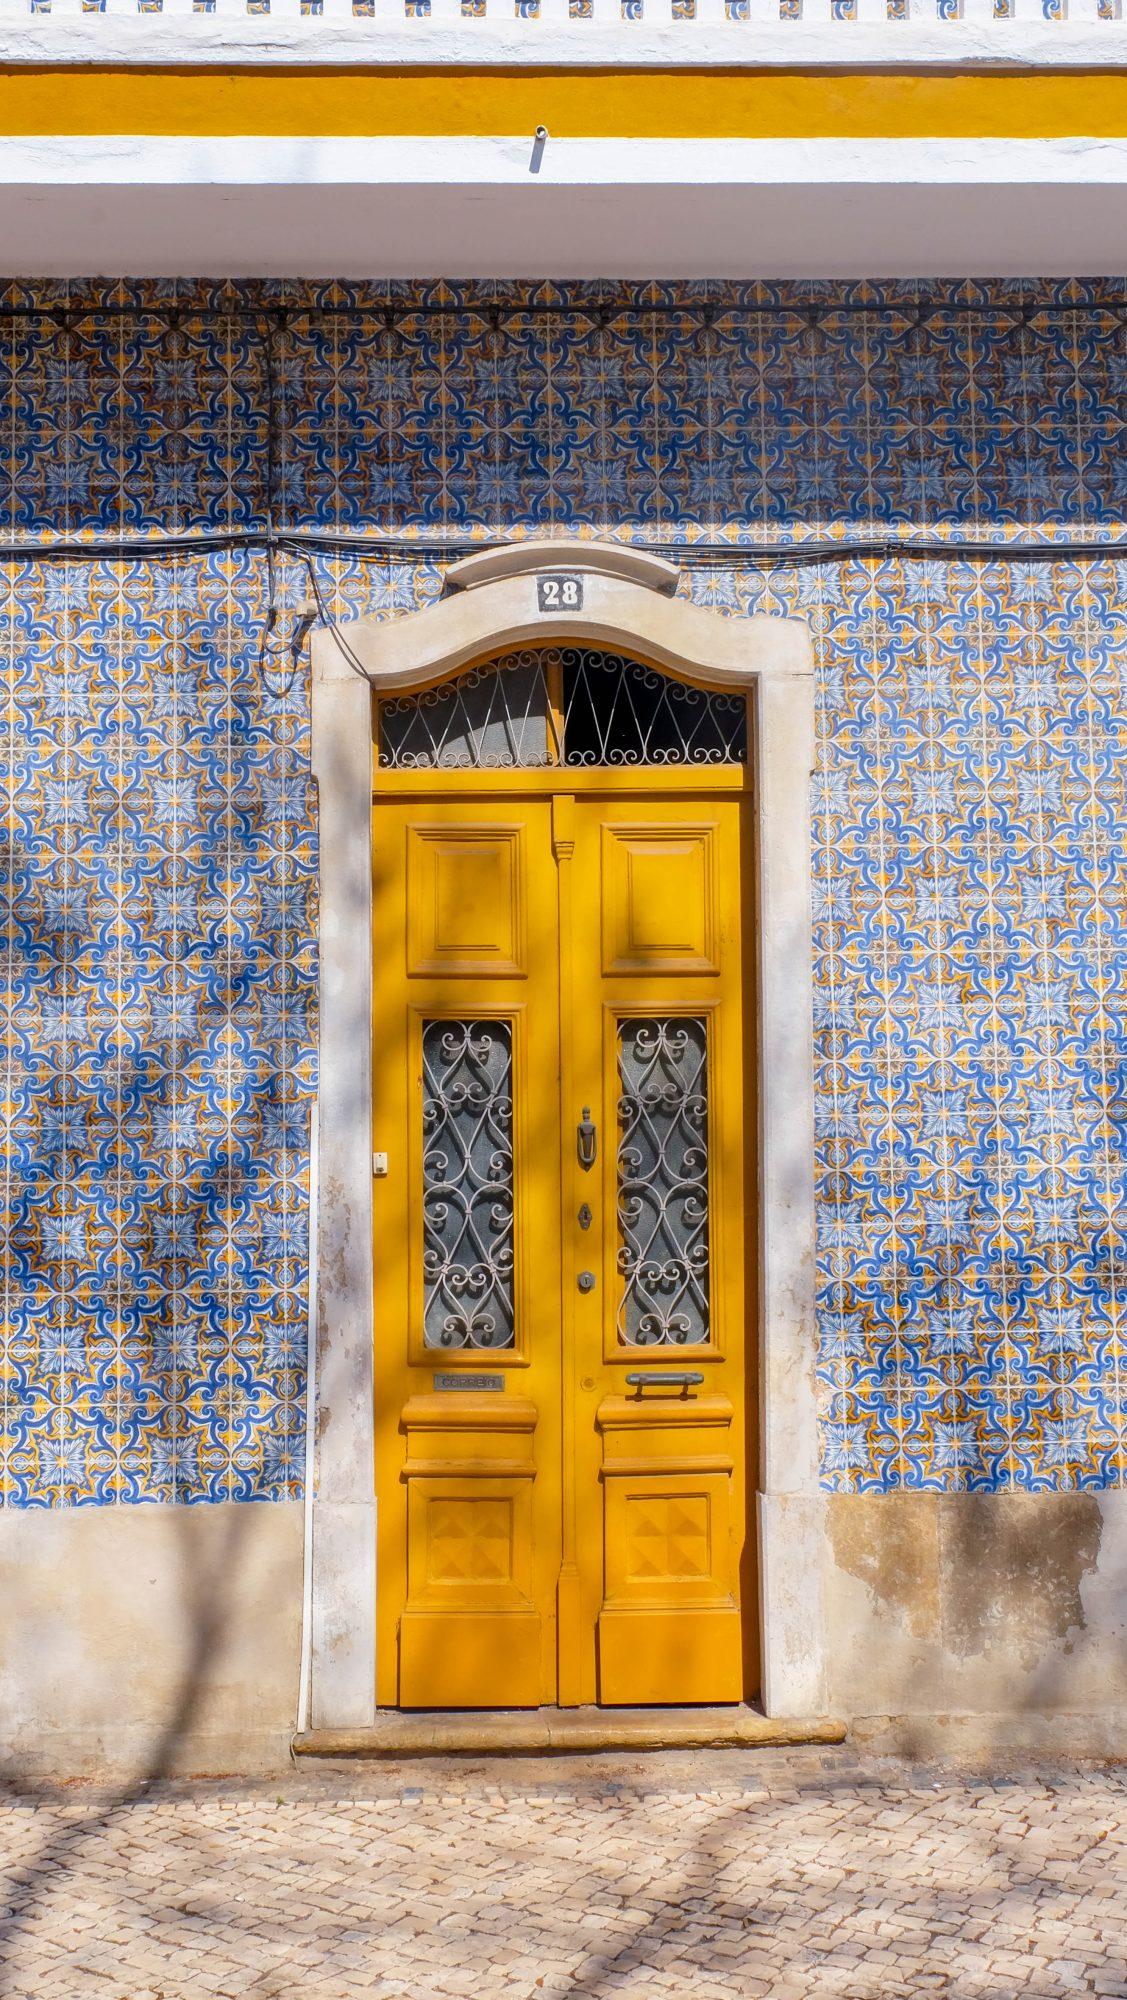 Porte avec Faience - Faro, Portugal